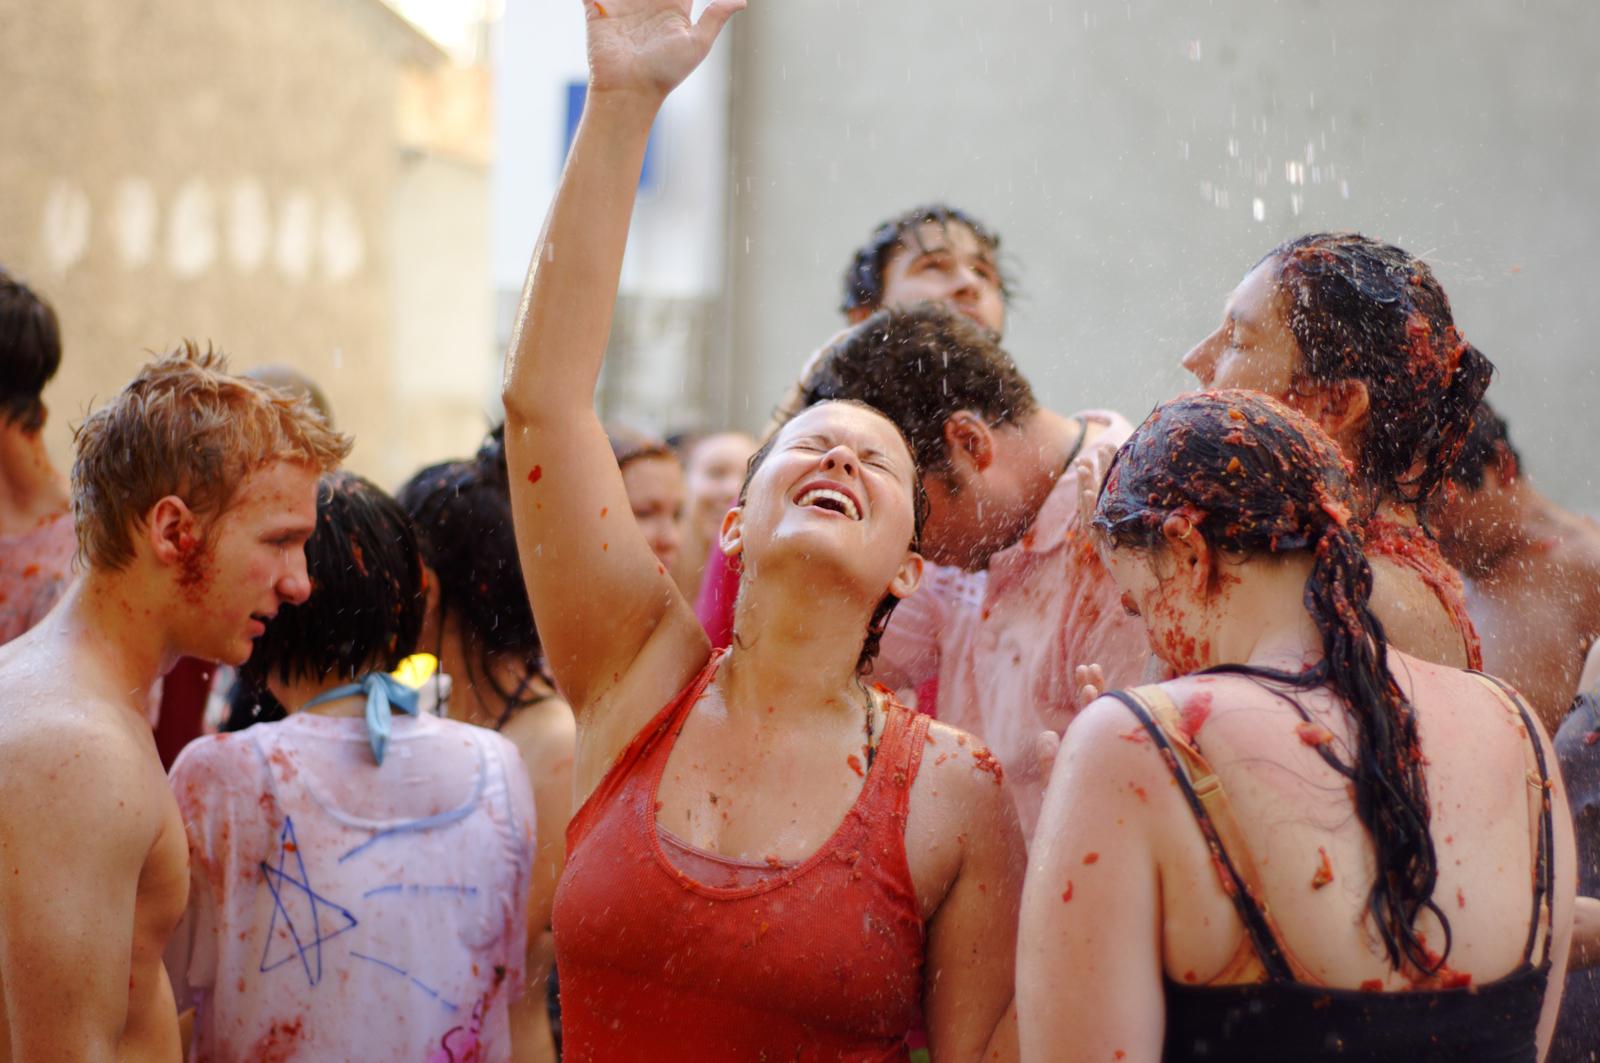 Washing off after La Tomatina festival